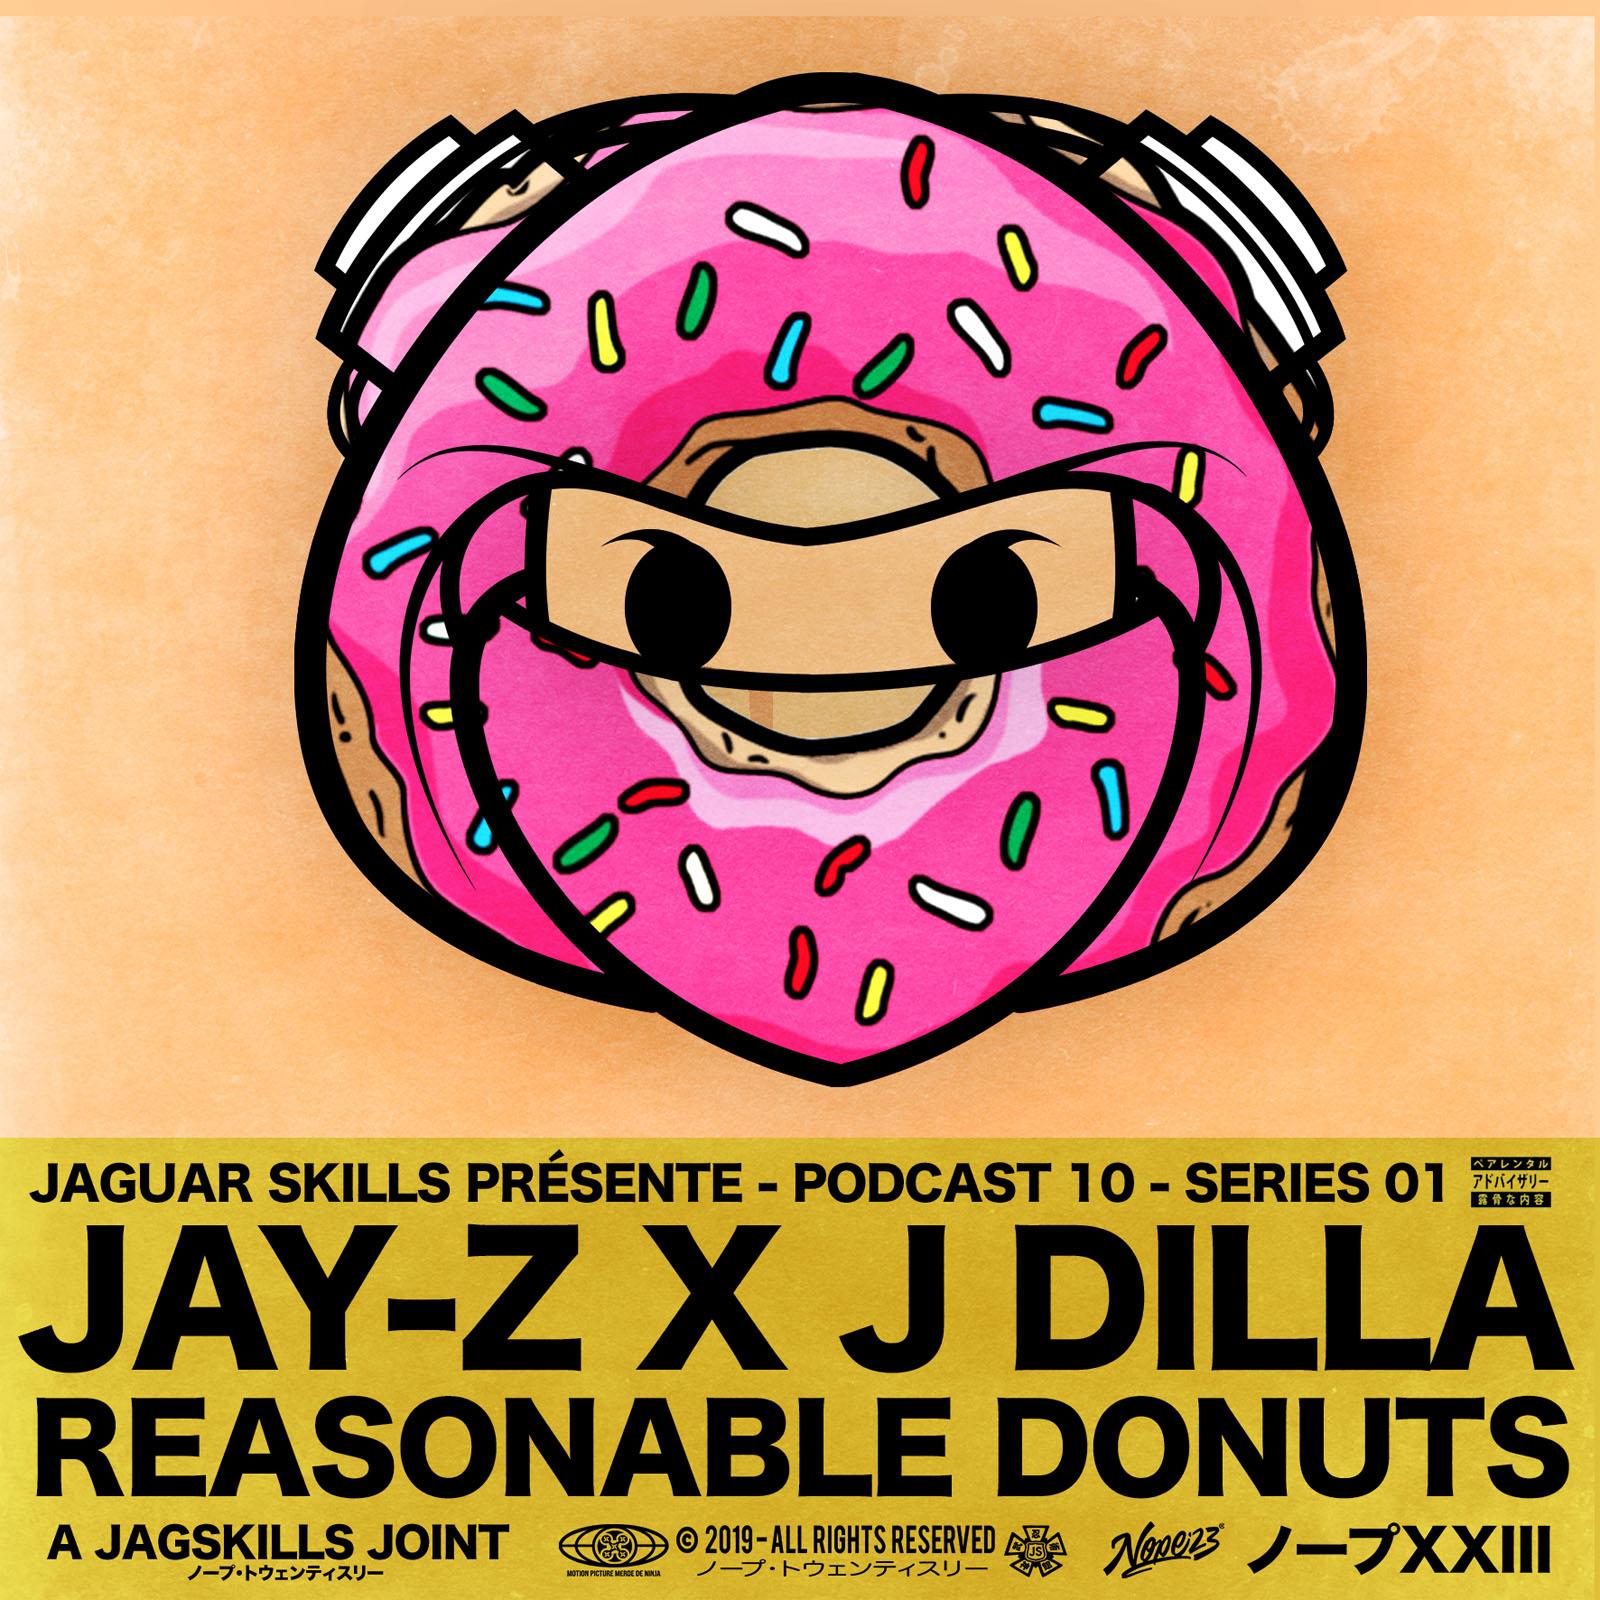 A JAGSKILLS JOINT – JAY-Z X J DILLA - REASONABLE DONUTS